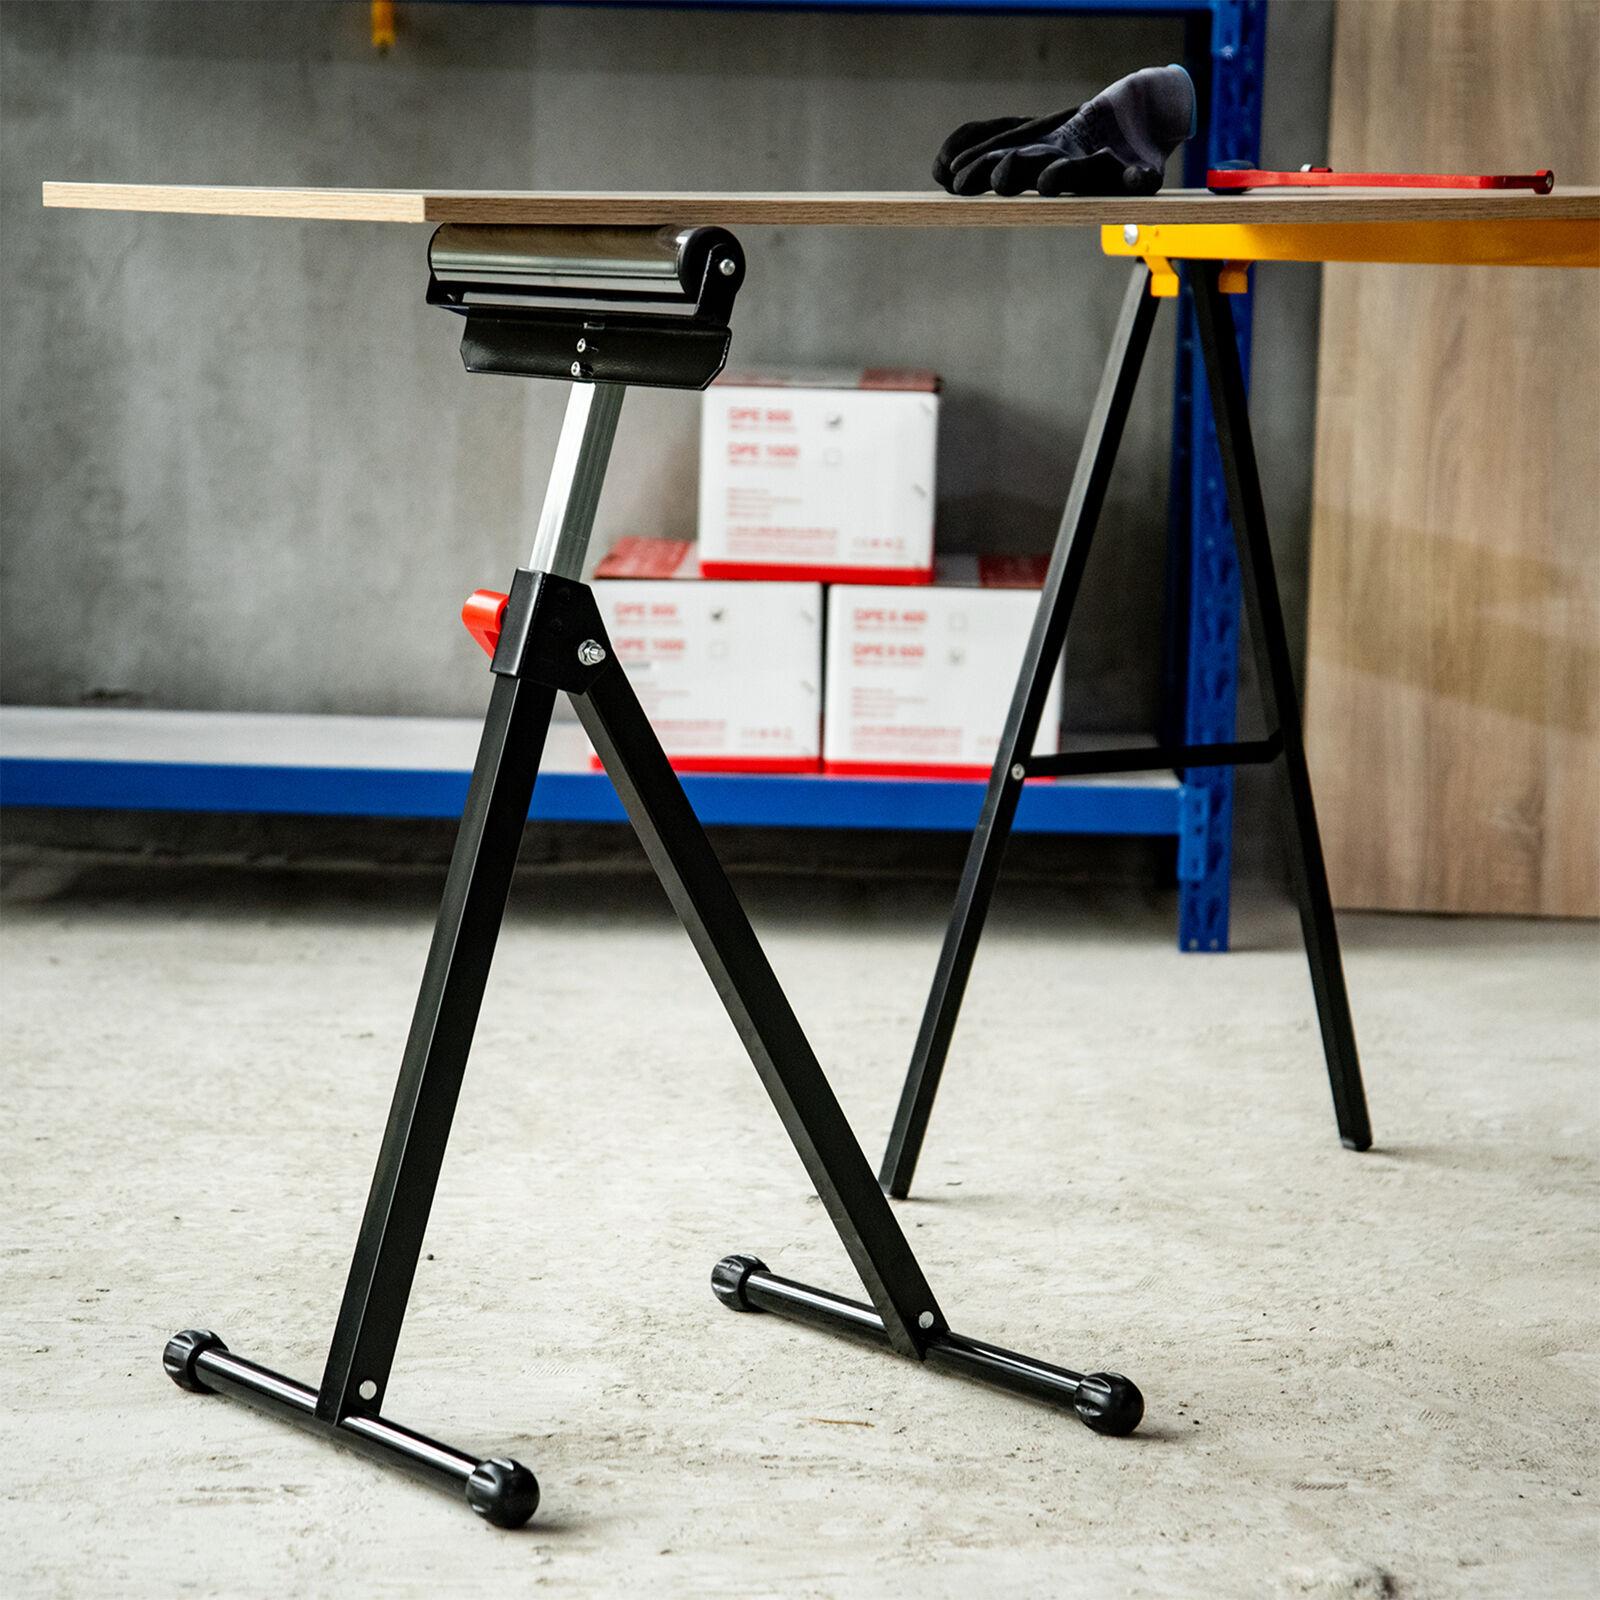 HOMCOM Roller Support Stand Metal Heavy Duty Adjustable Foldable - £21.99 @ 2011homcom / eBay